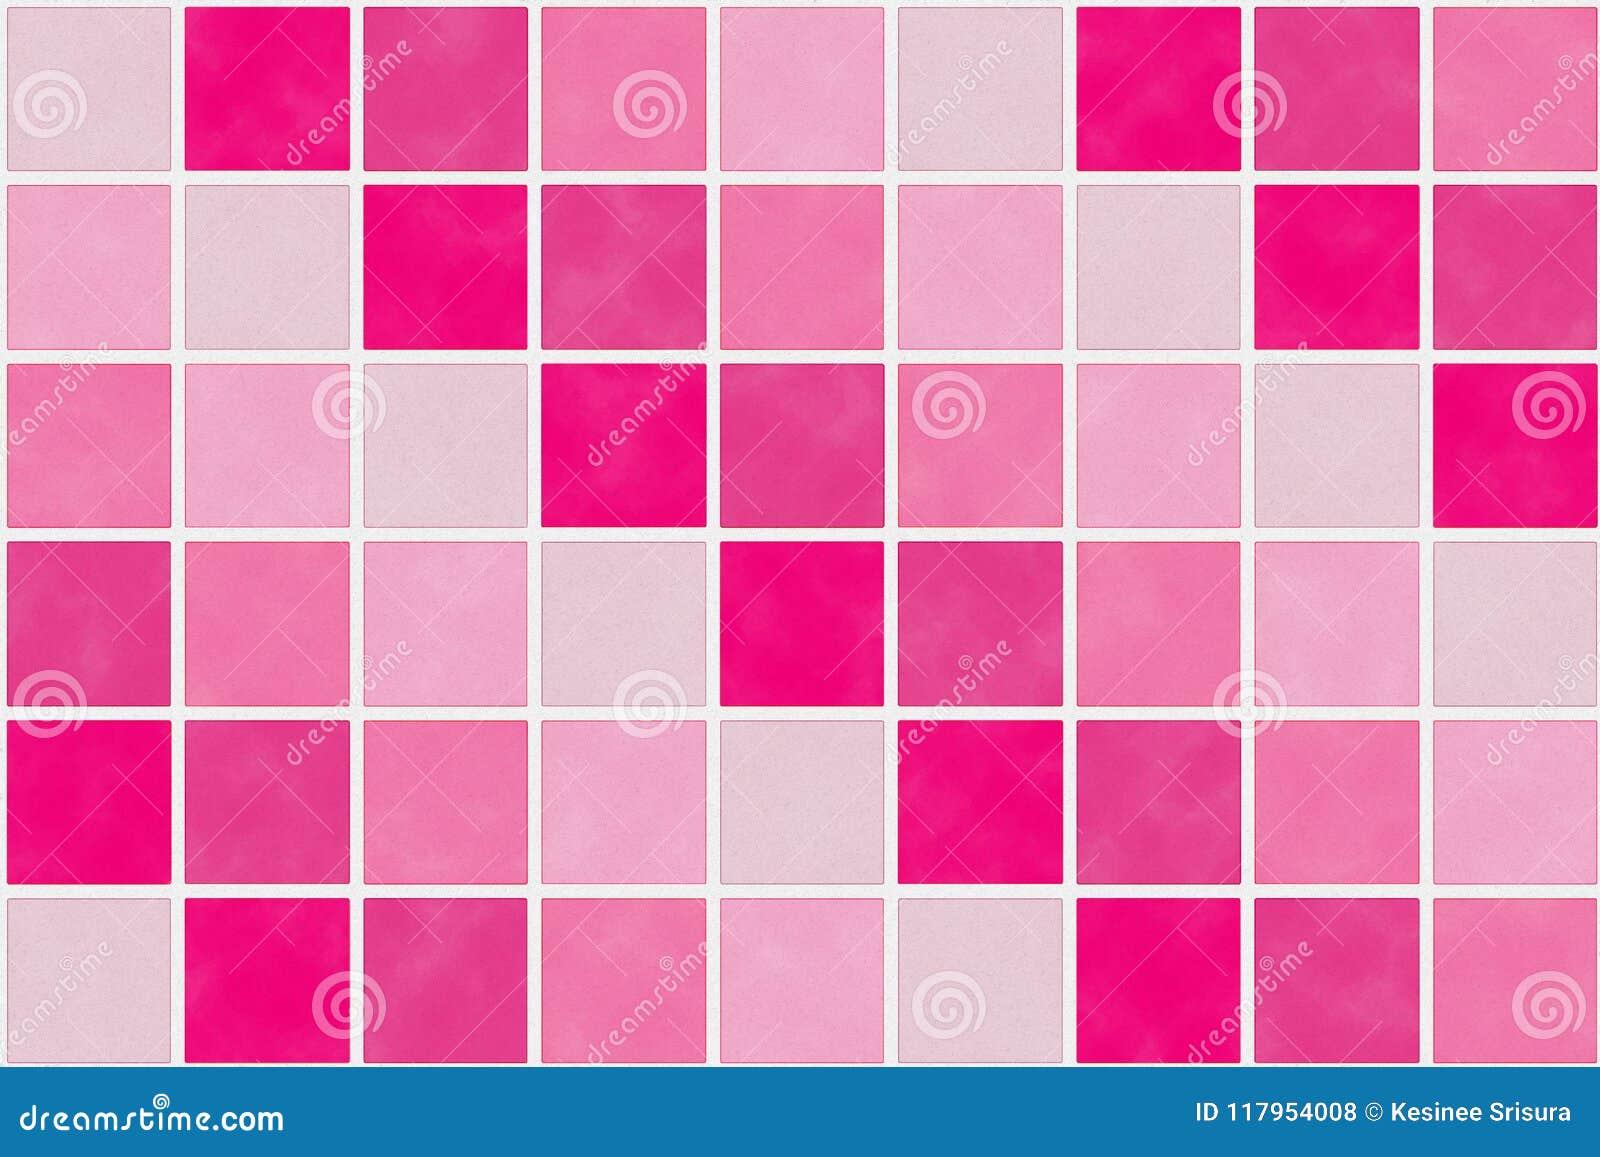 Quadratisches Muster Im Roten Und Rosa Farbton Stock Abbildung